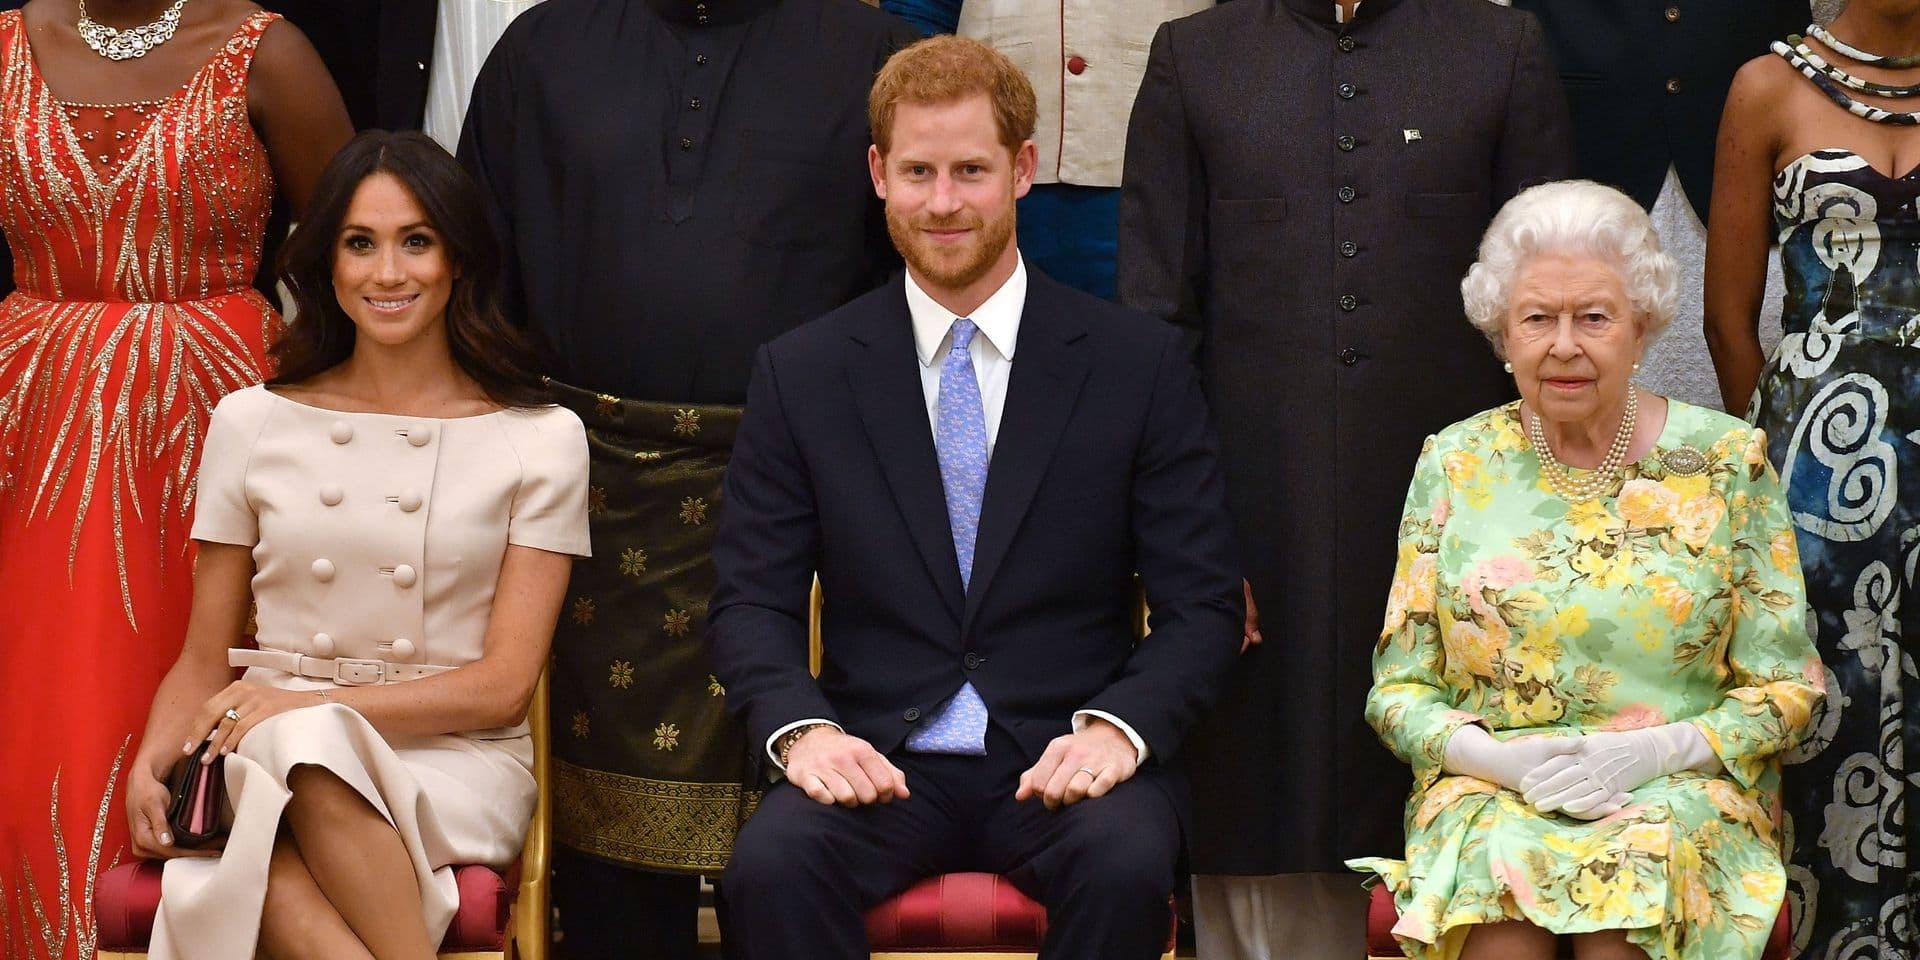 Une demande culottée de Meghan et Harry mettrait Elizabeth II dans l'embarras